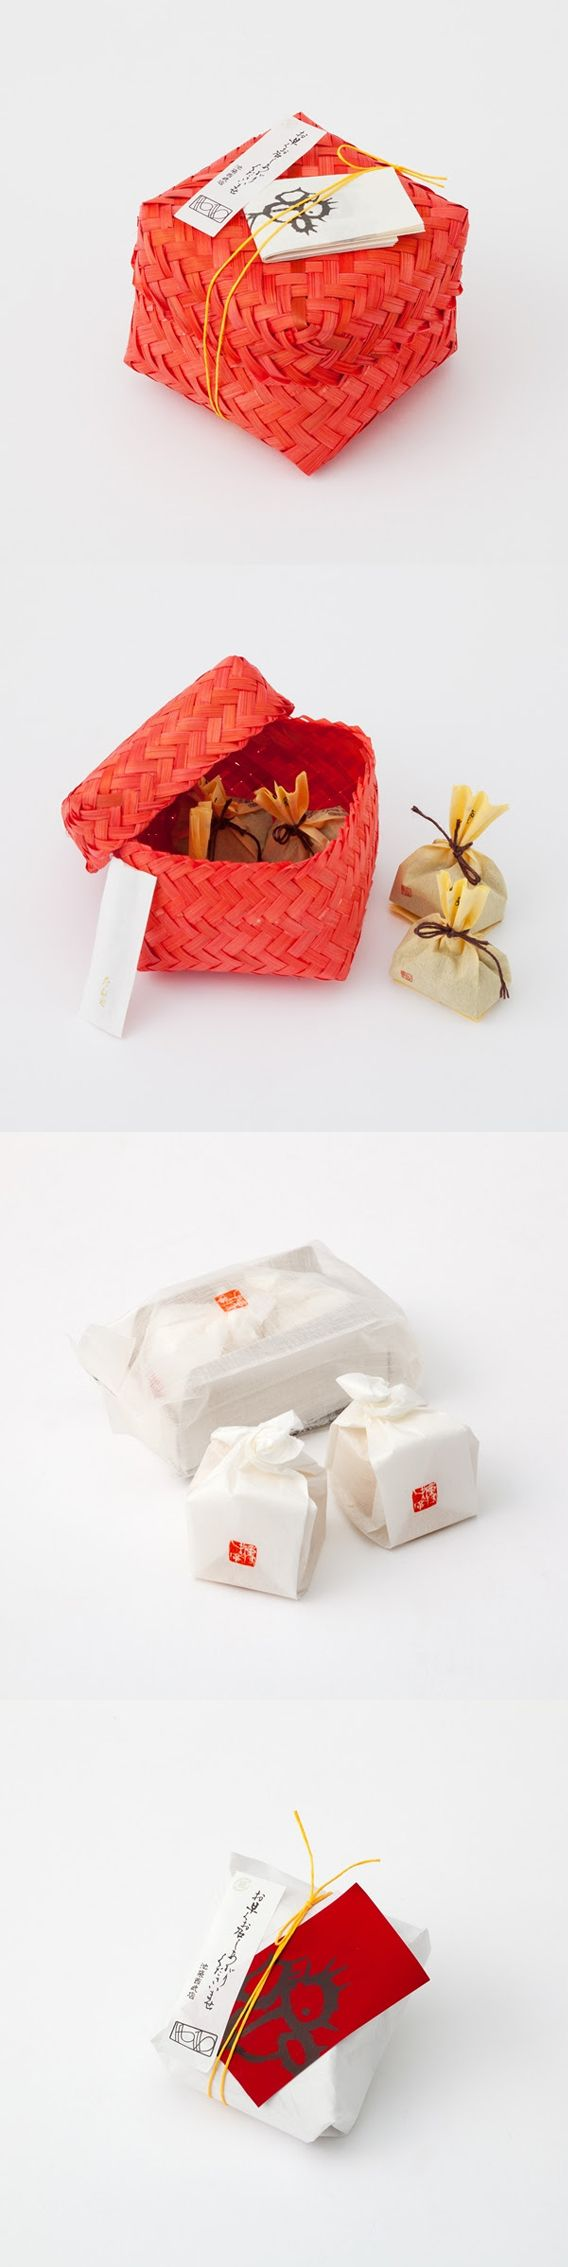 Unique Packaging Design on the Internet, Taneya Japanese Sweets Chestnuts #packagingdesign #packaging #design http://www.pinterest.com/aldenchong/design/